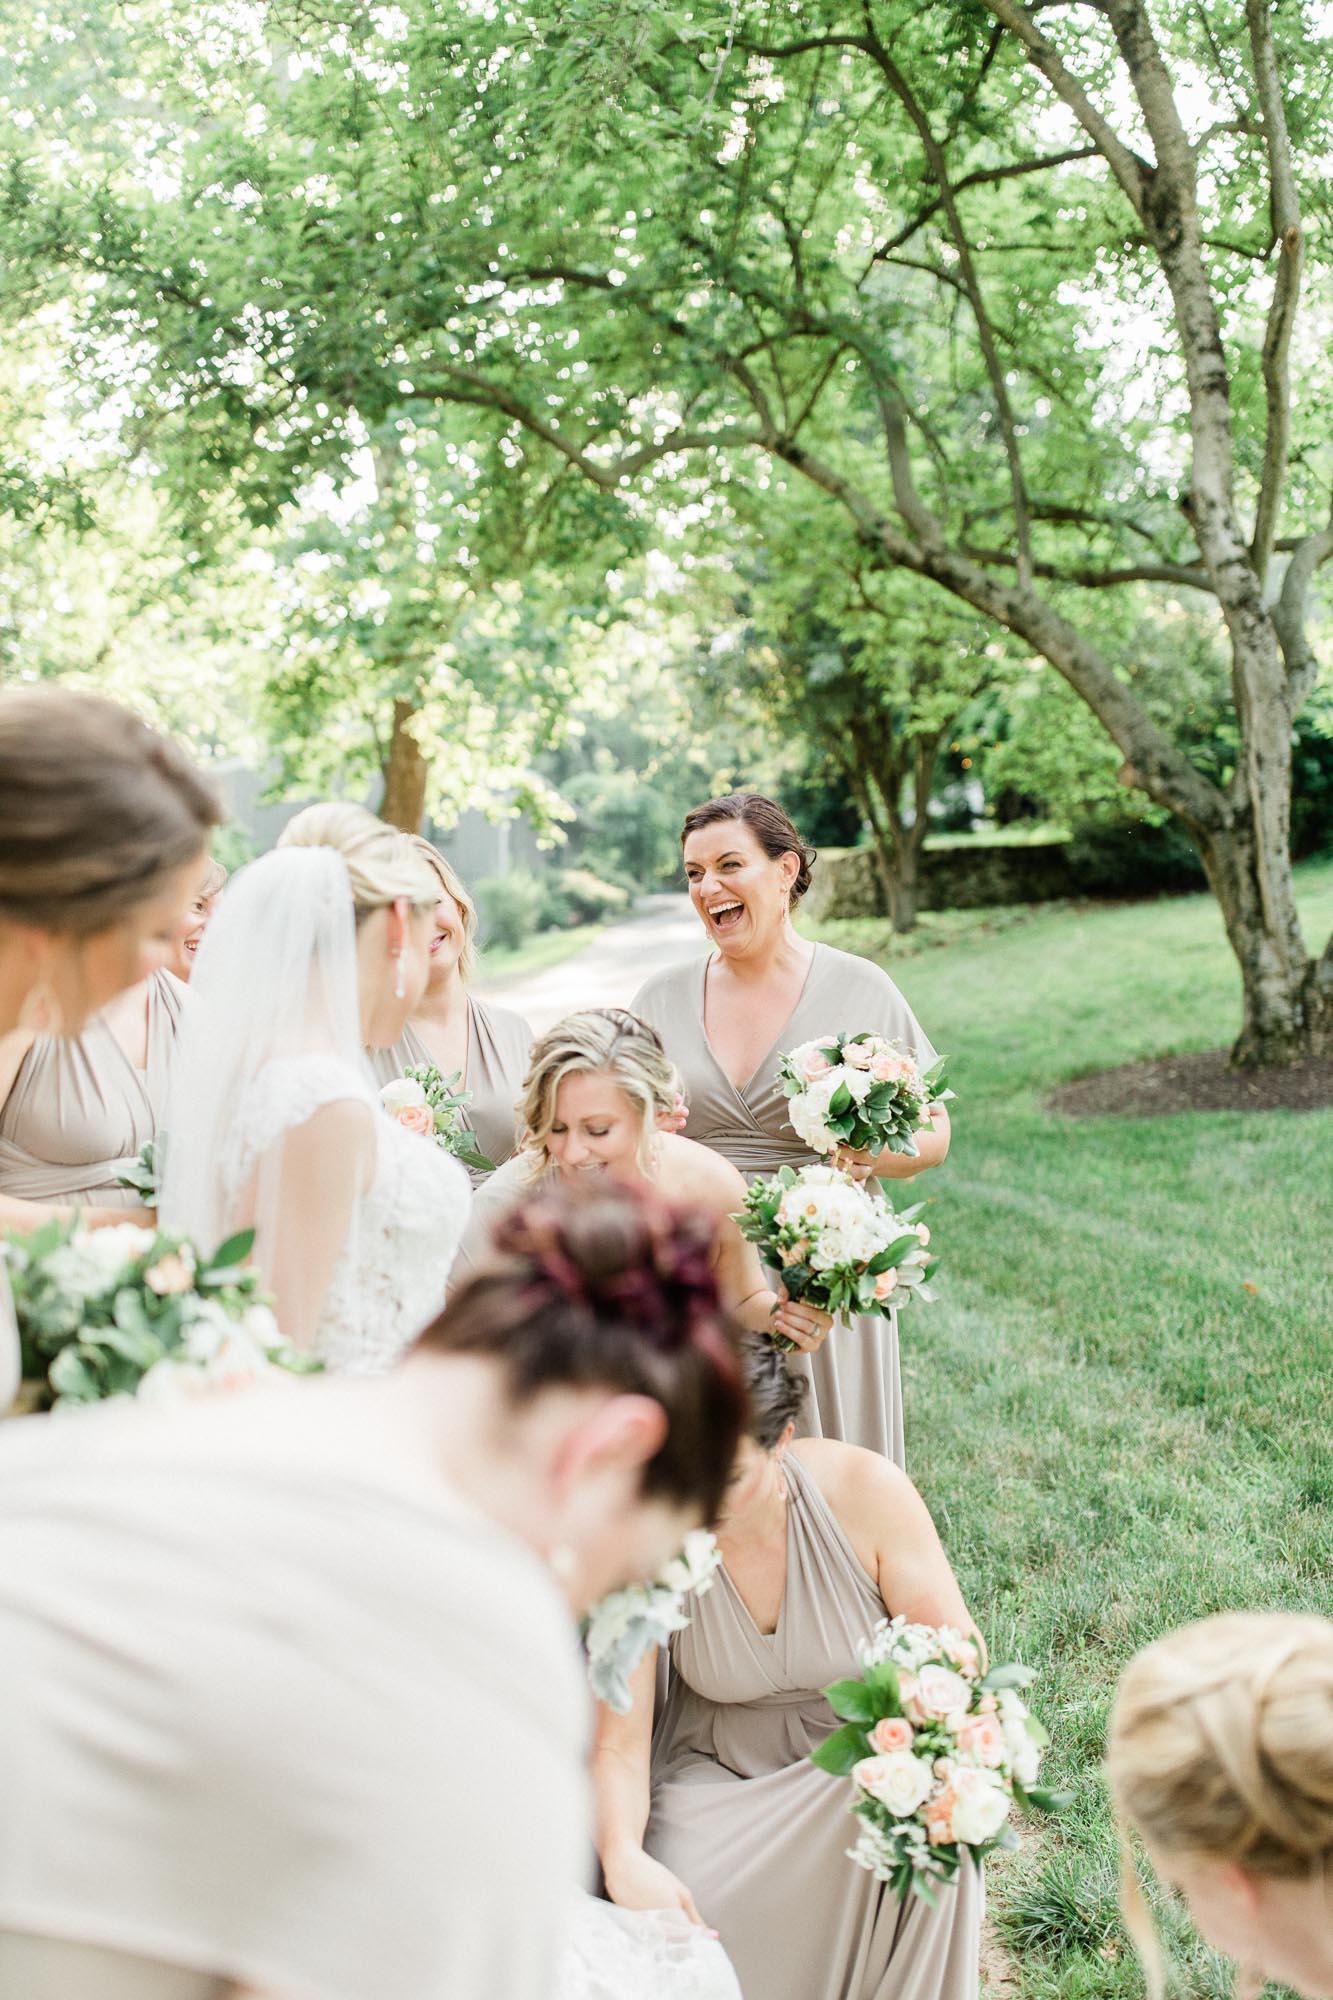 Allenberry-resort-historic-pennsylvania-wedding-10208.jpg